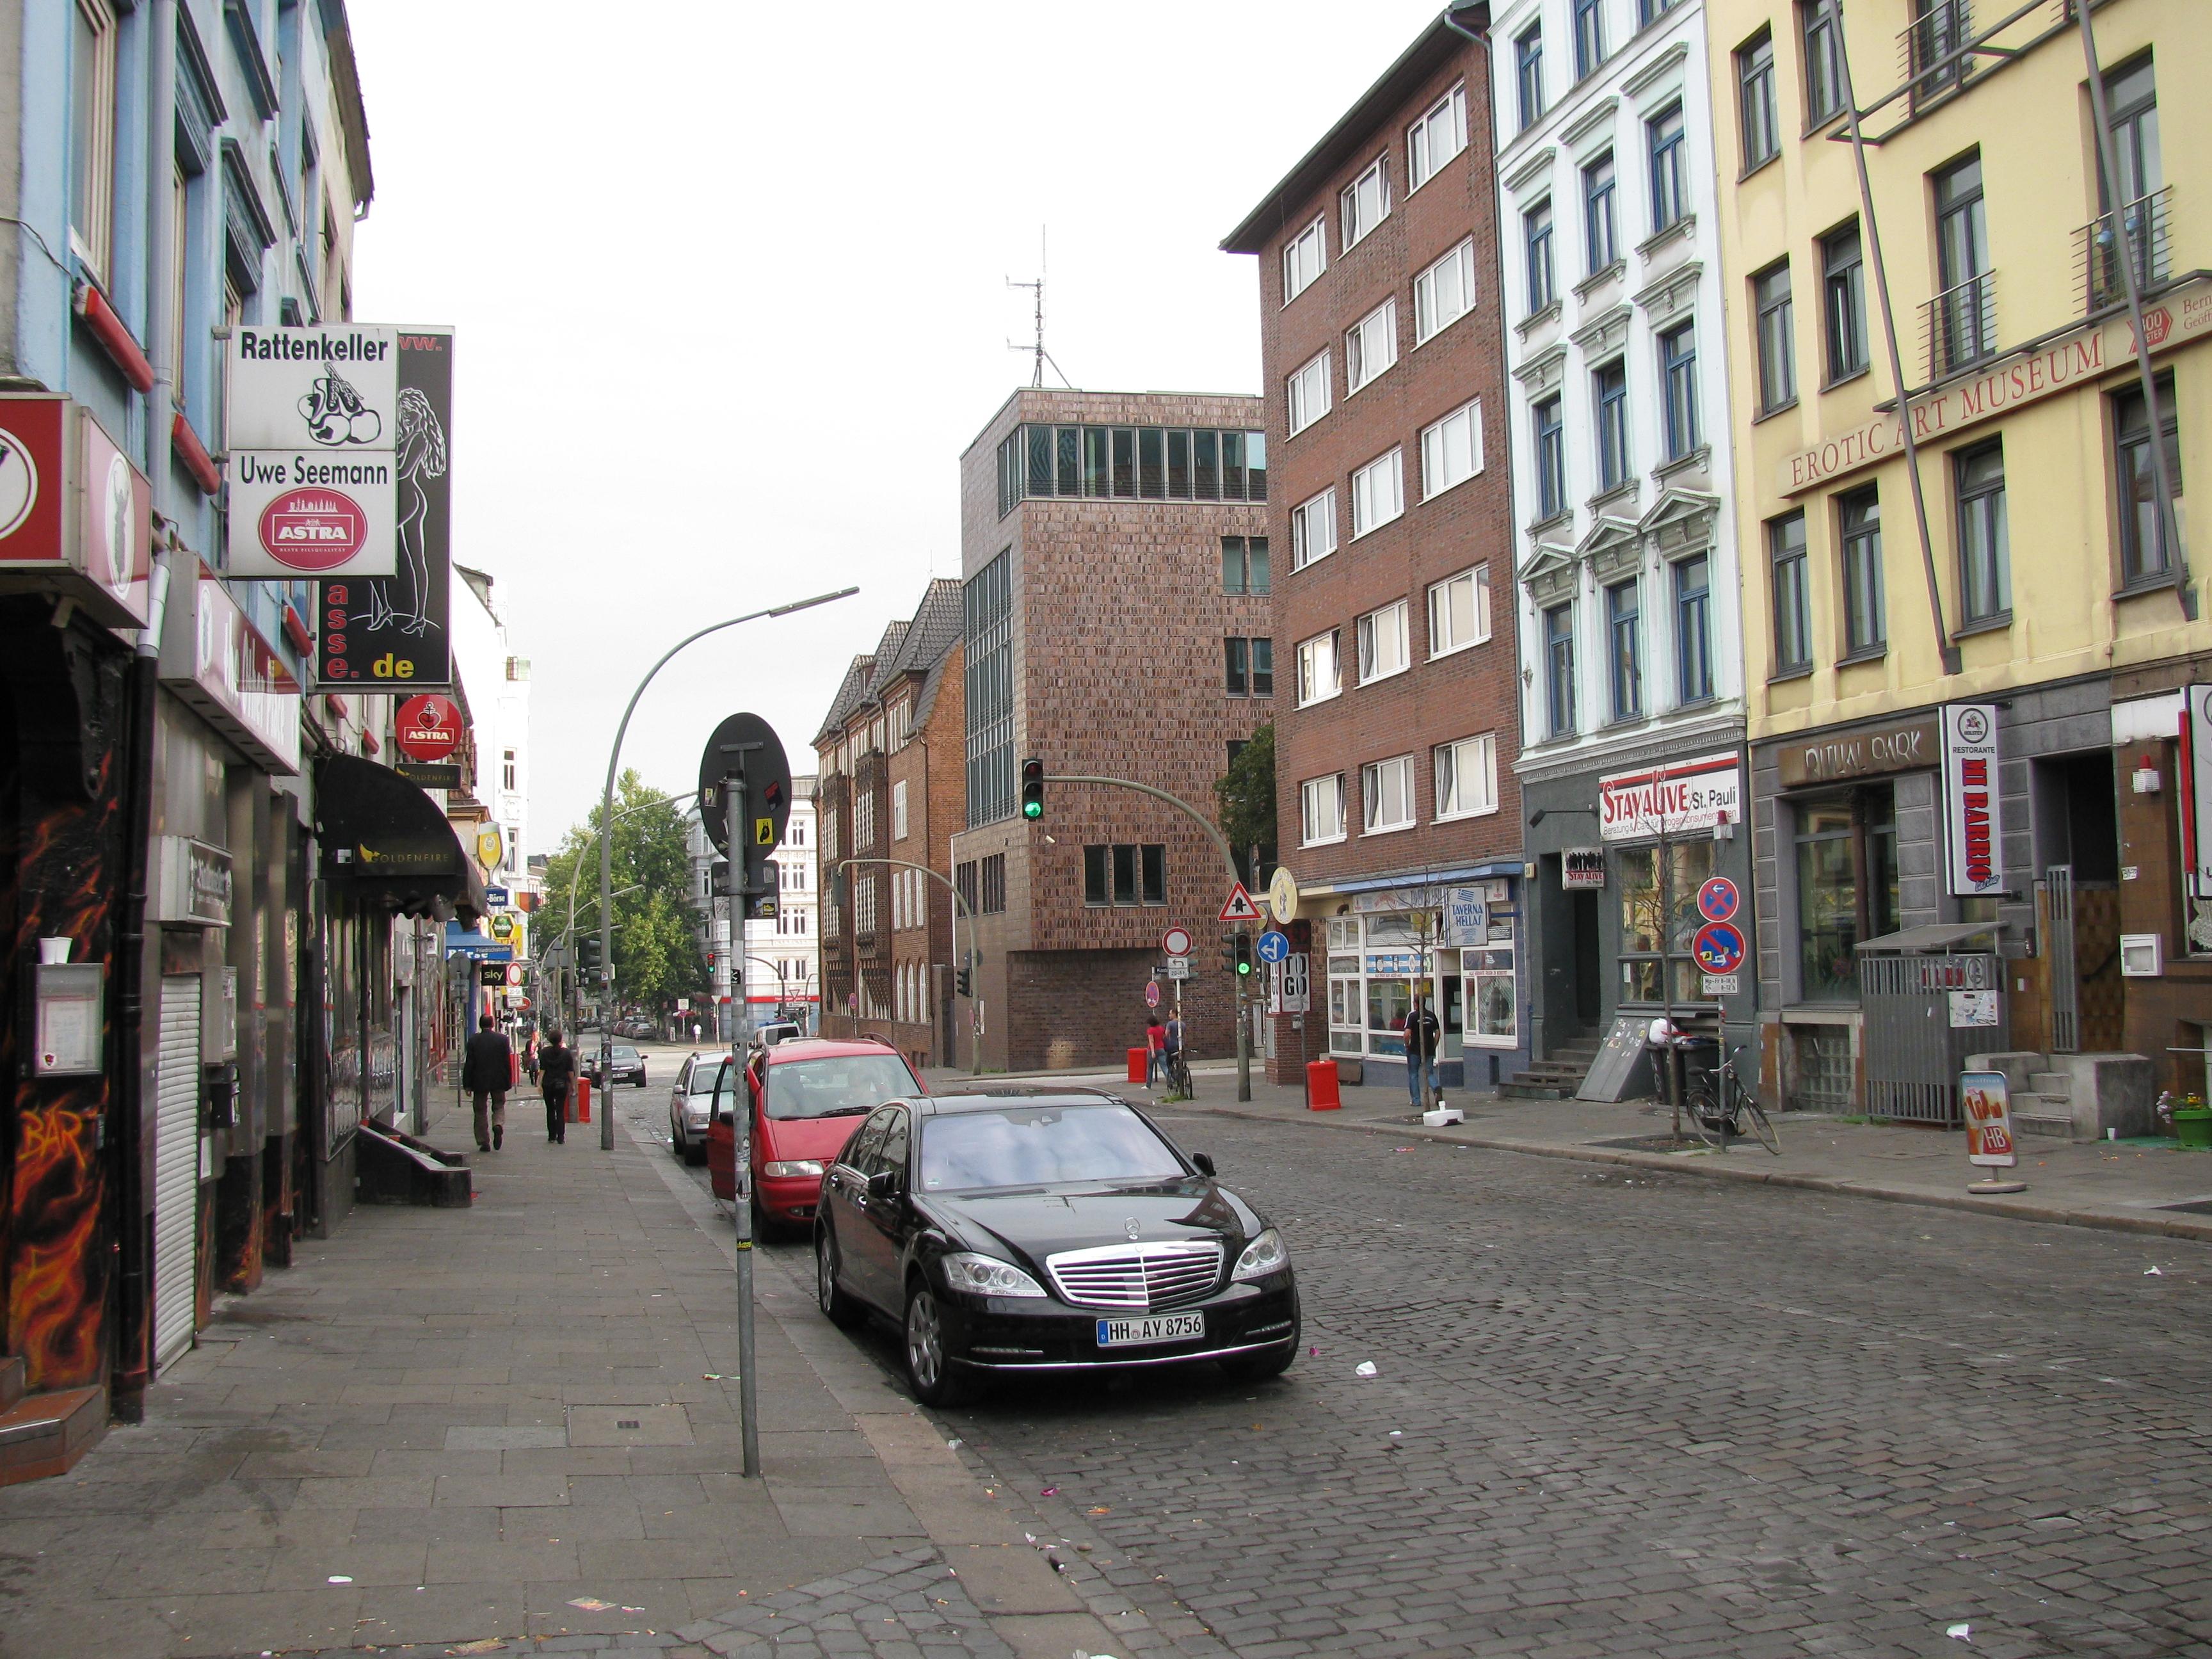 File:Davidstraße, 3, St. Pauli, Hamburg.jpg - Wikimedia